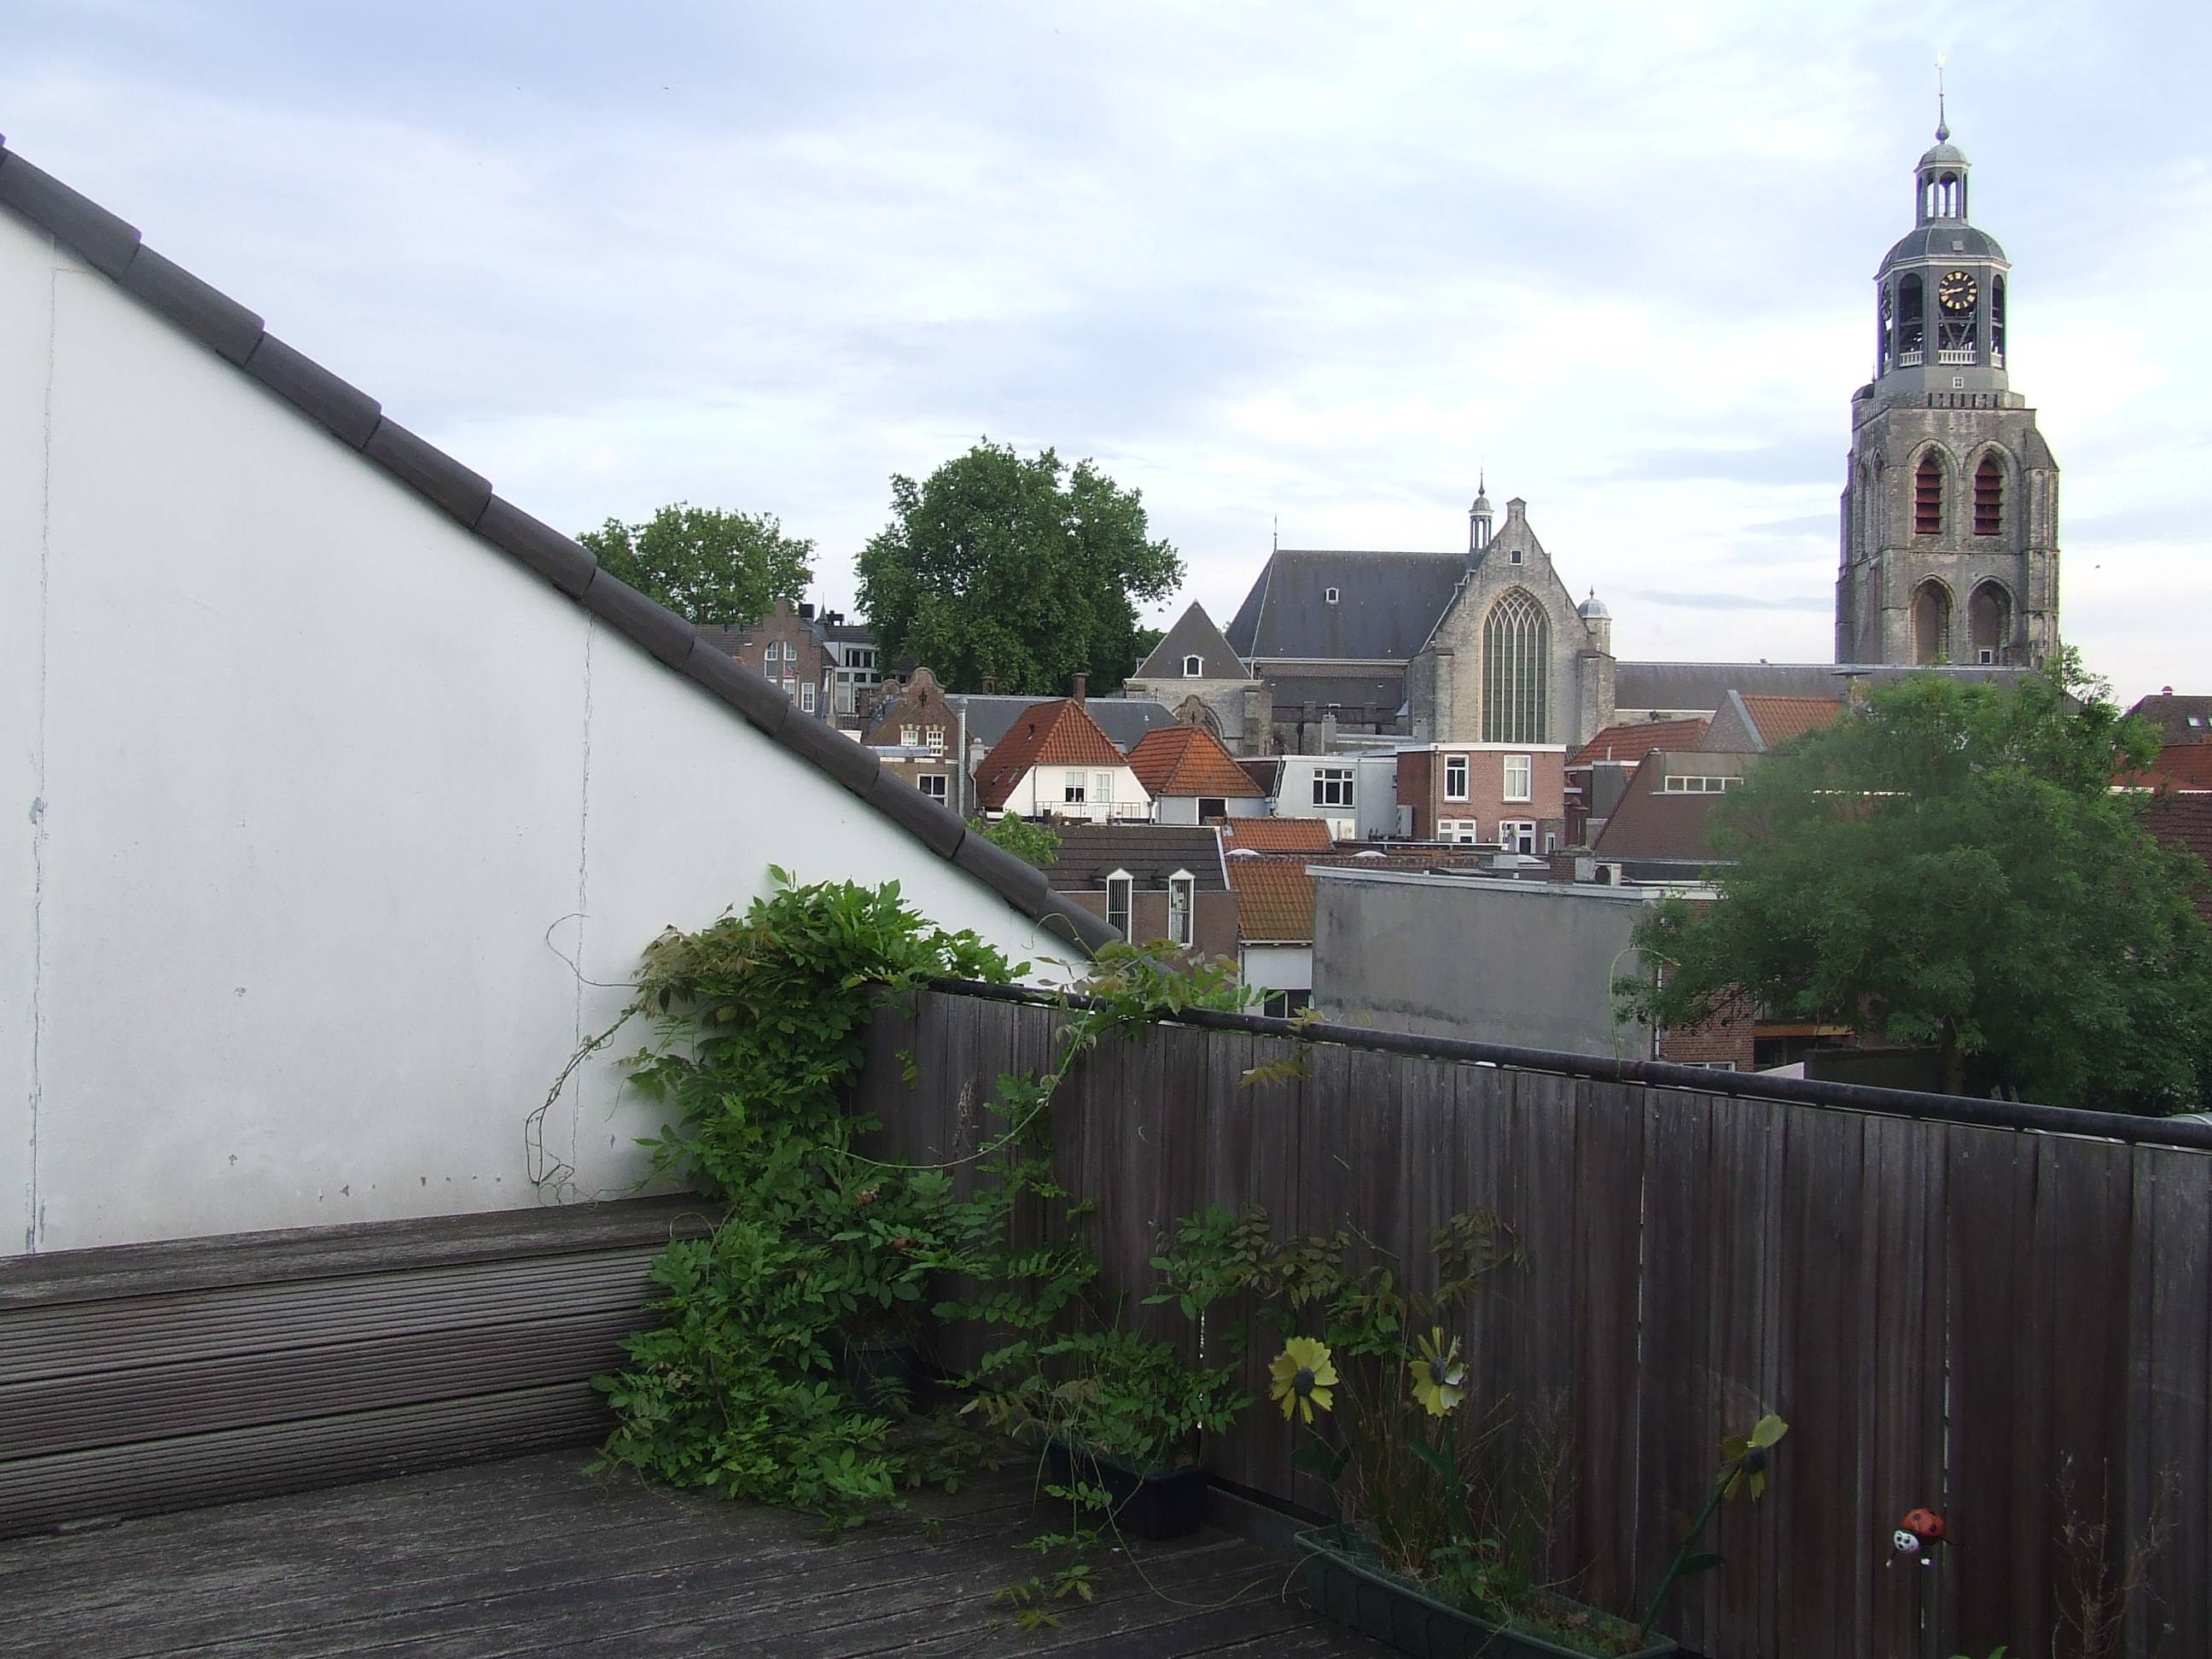 https://public.parariusoffice.nl/170/photos/huge/2227030.1401530707-80.JPG